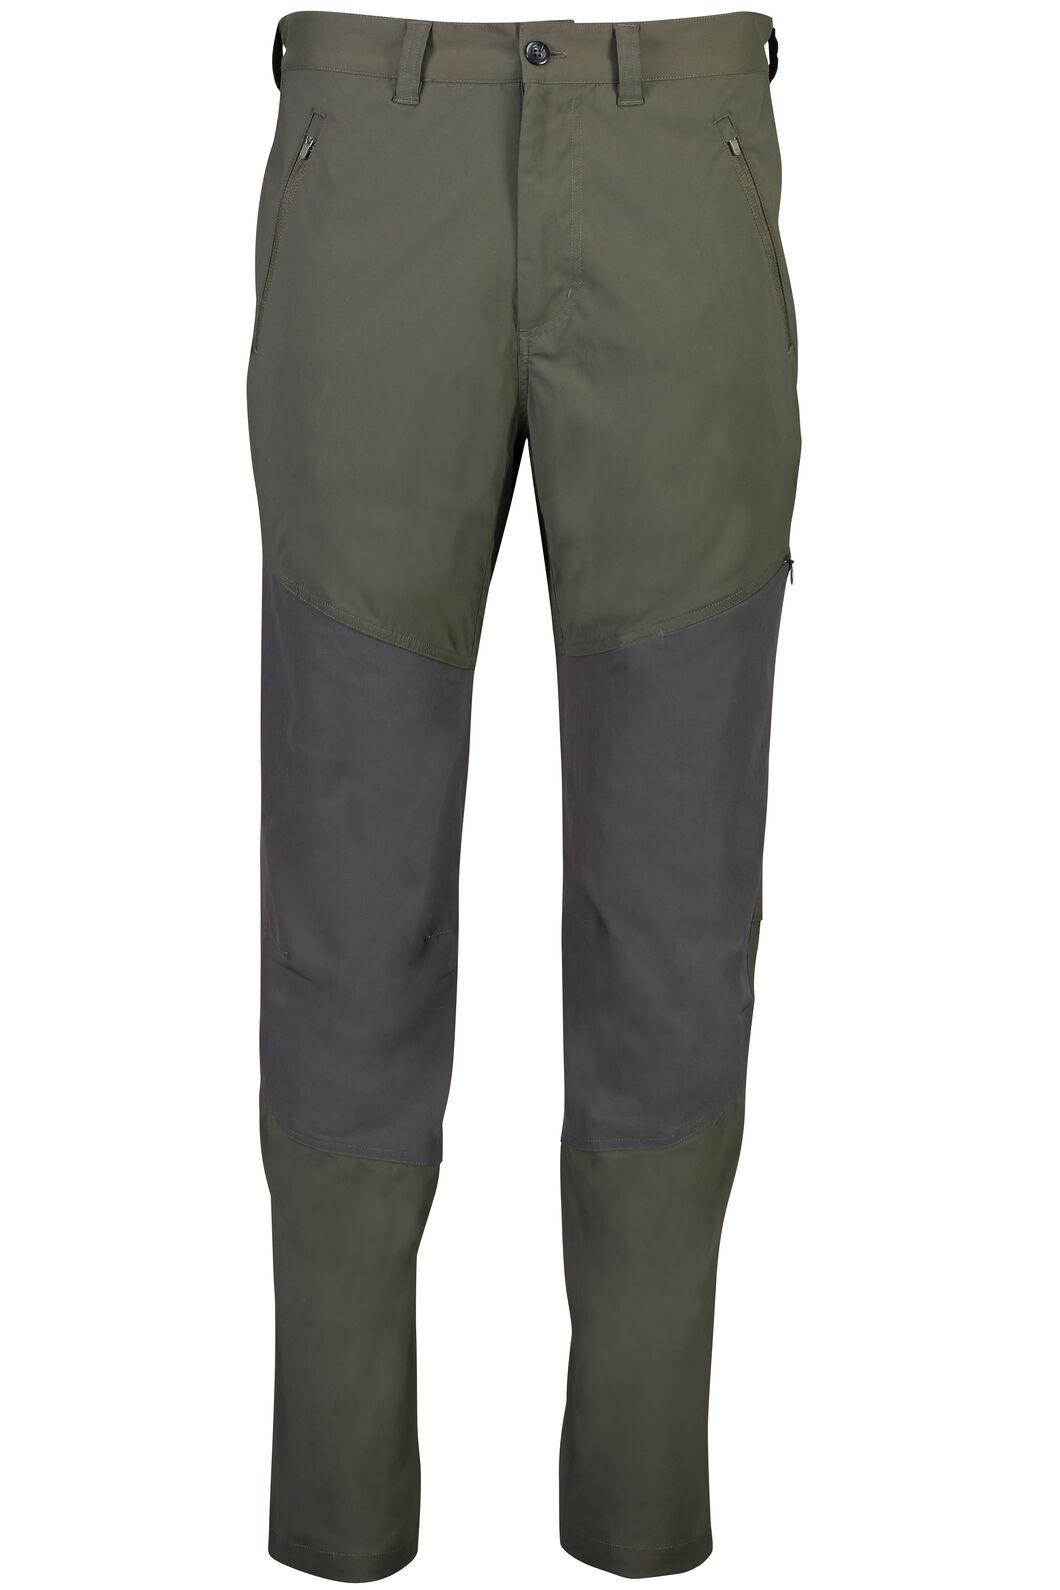 Endurance Pants - Men's, Peat, hi-res